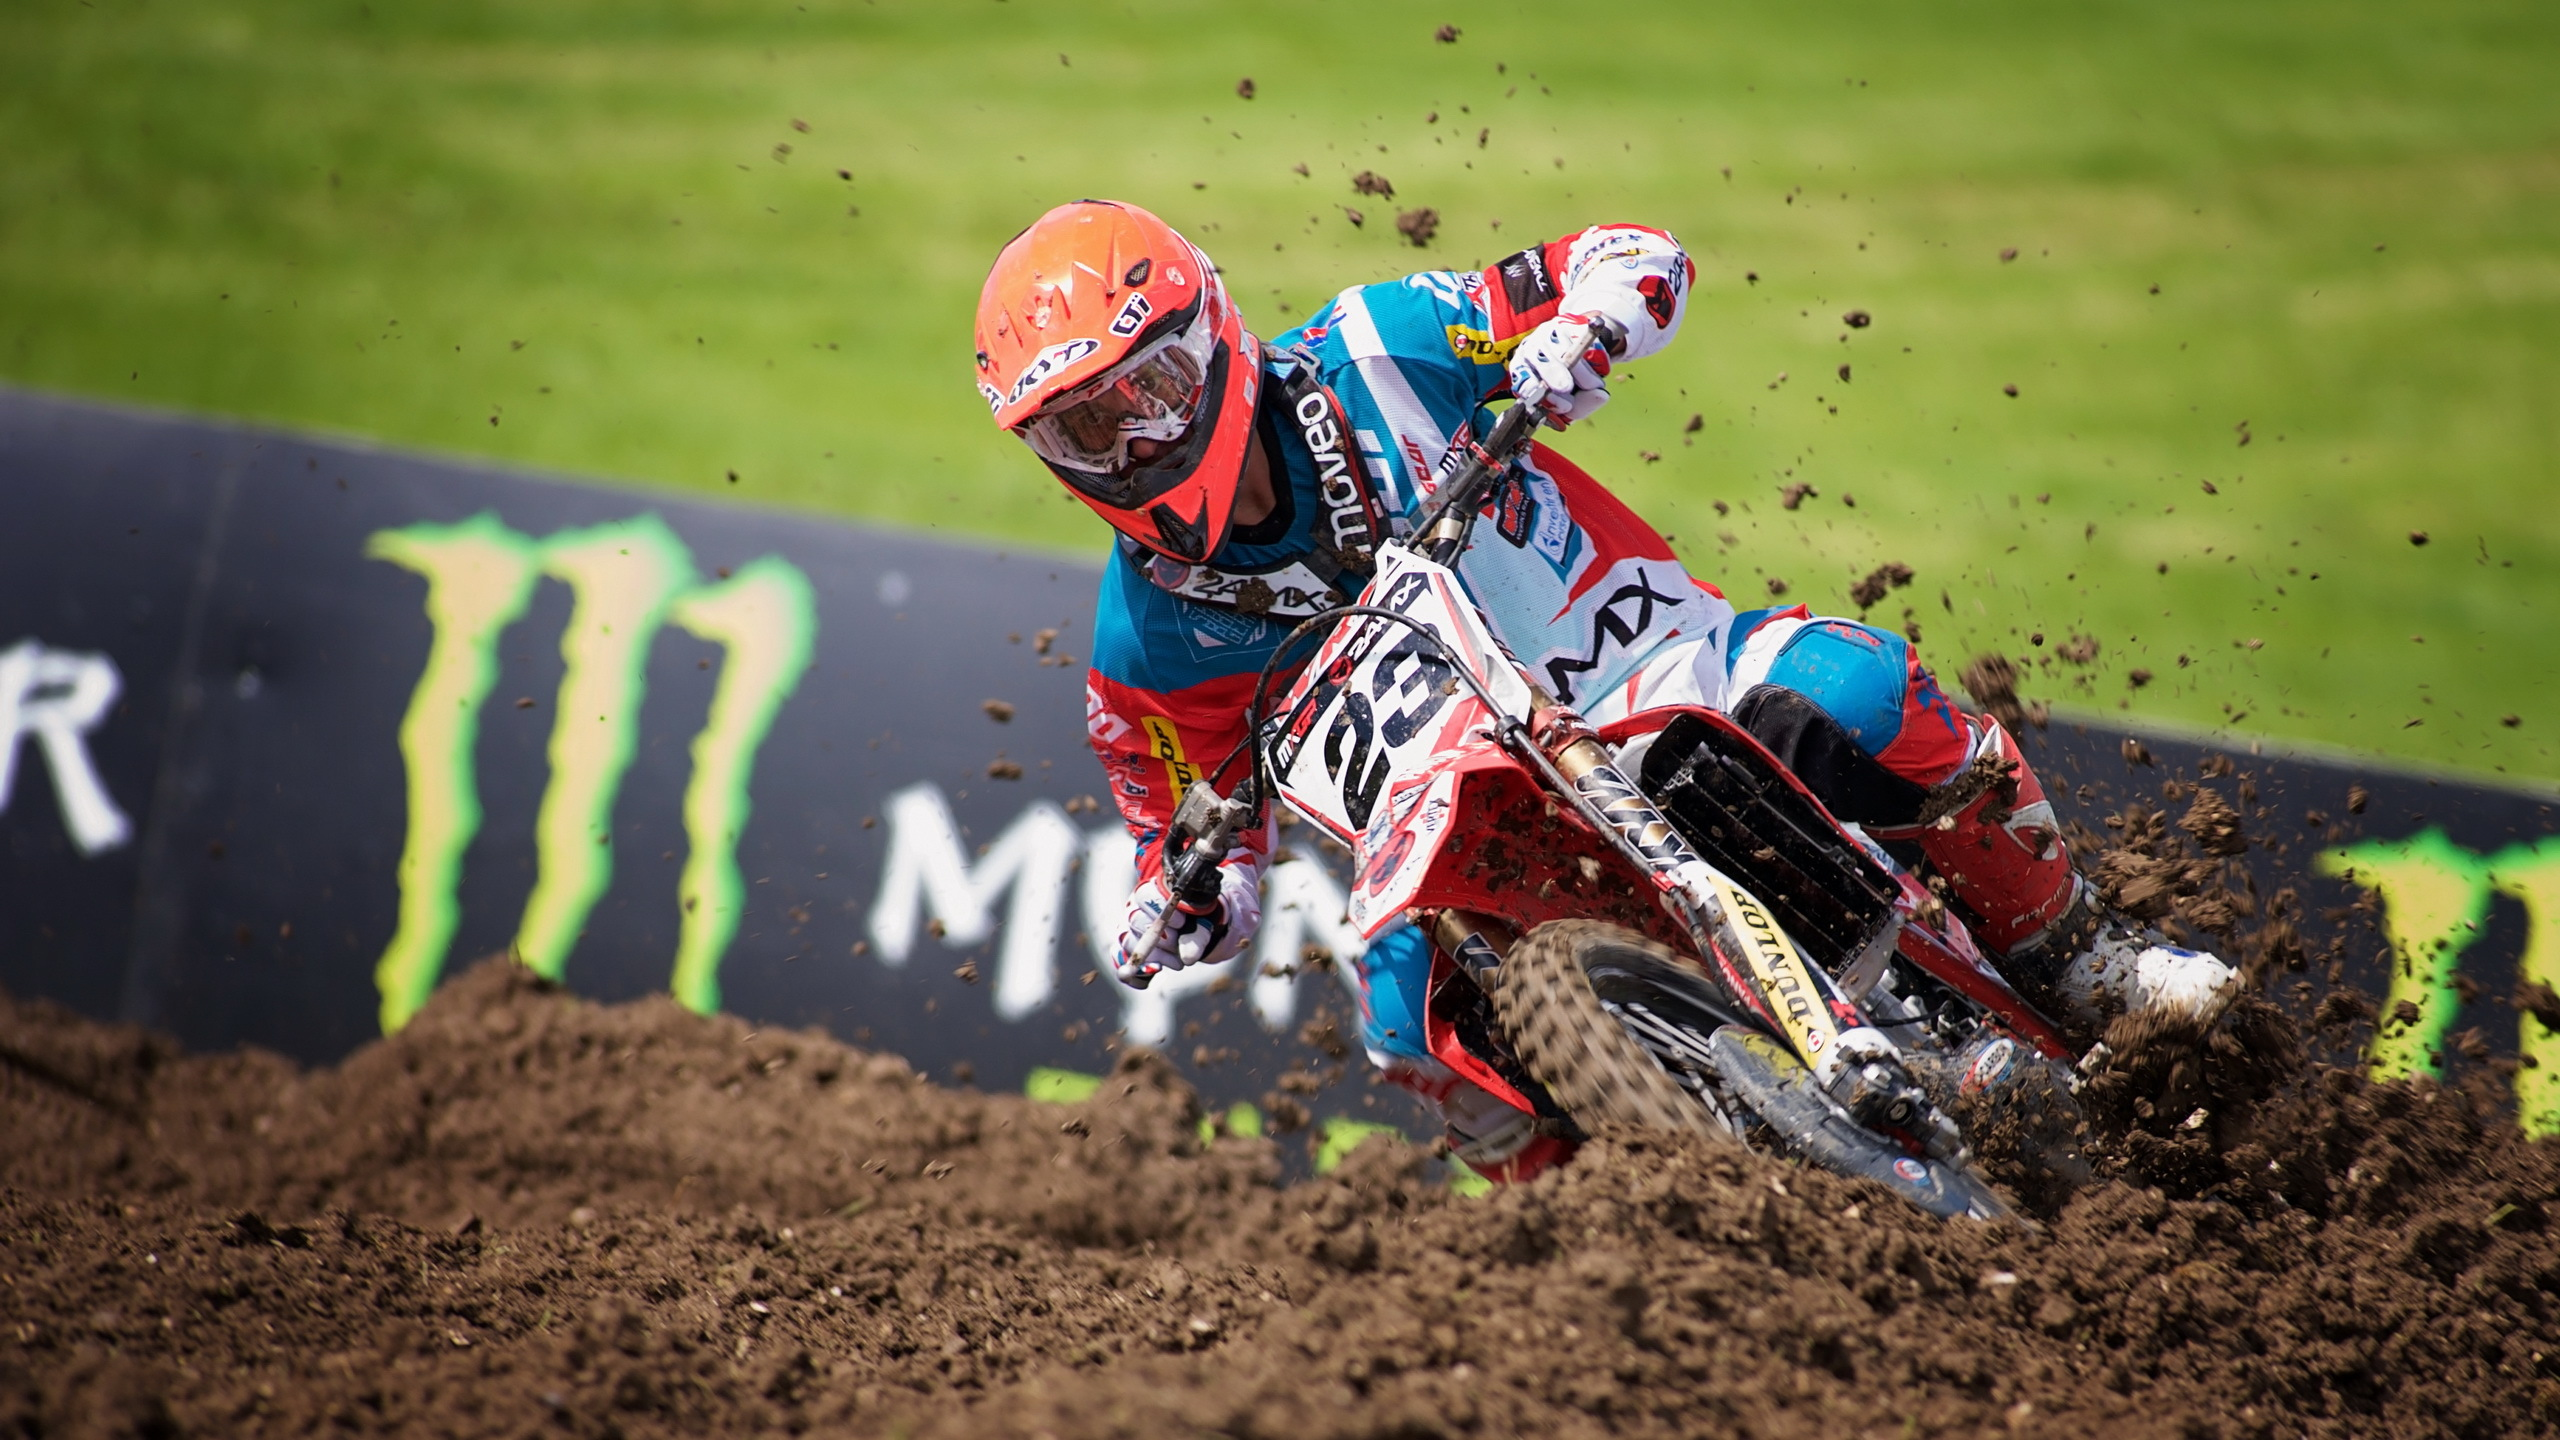 спорт мотоцикл гонка sports motorcycle race  № 3296489 загрузить